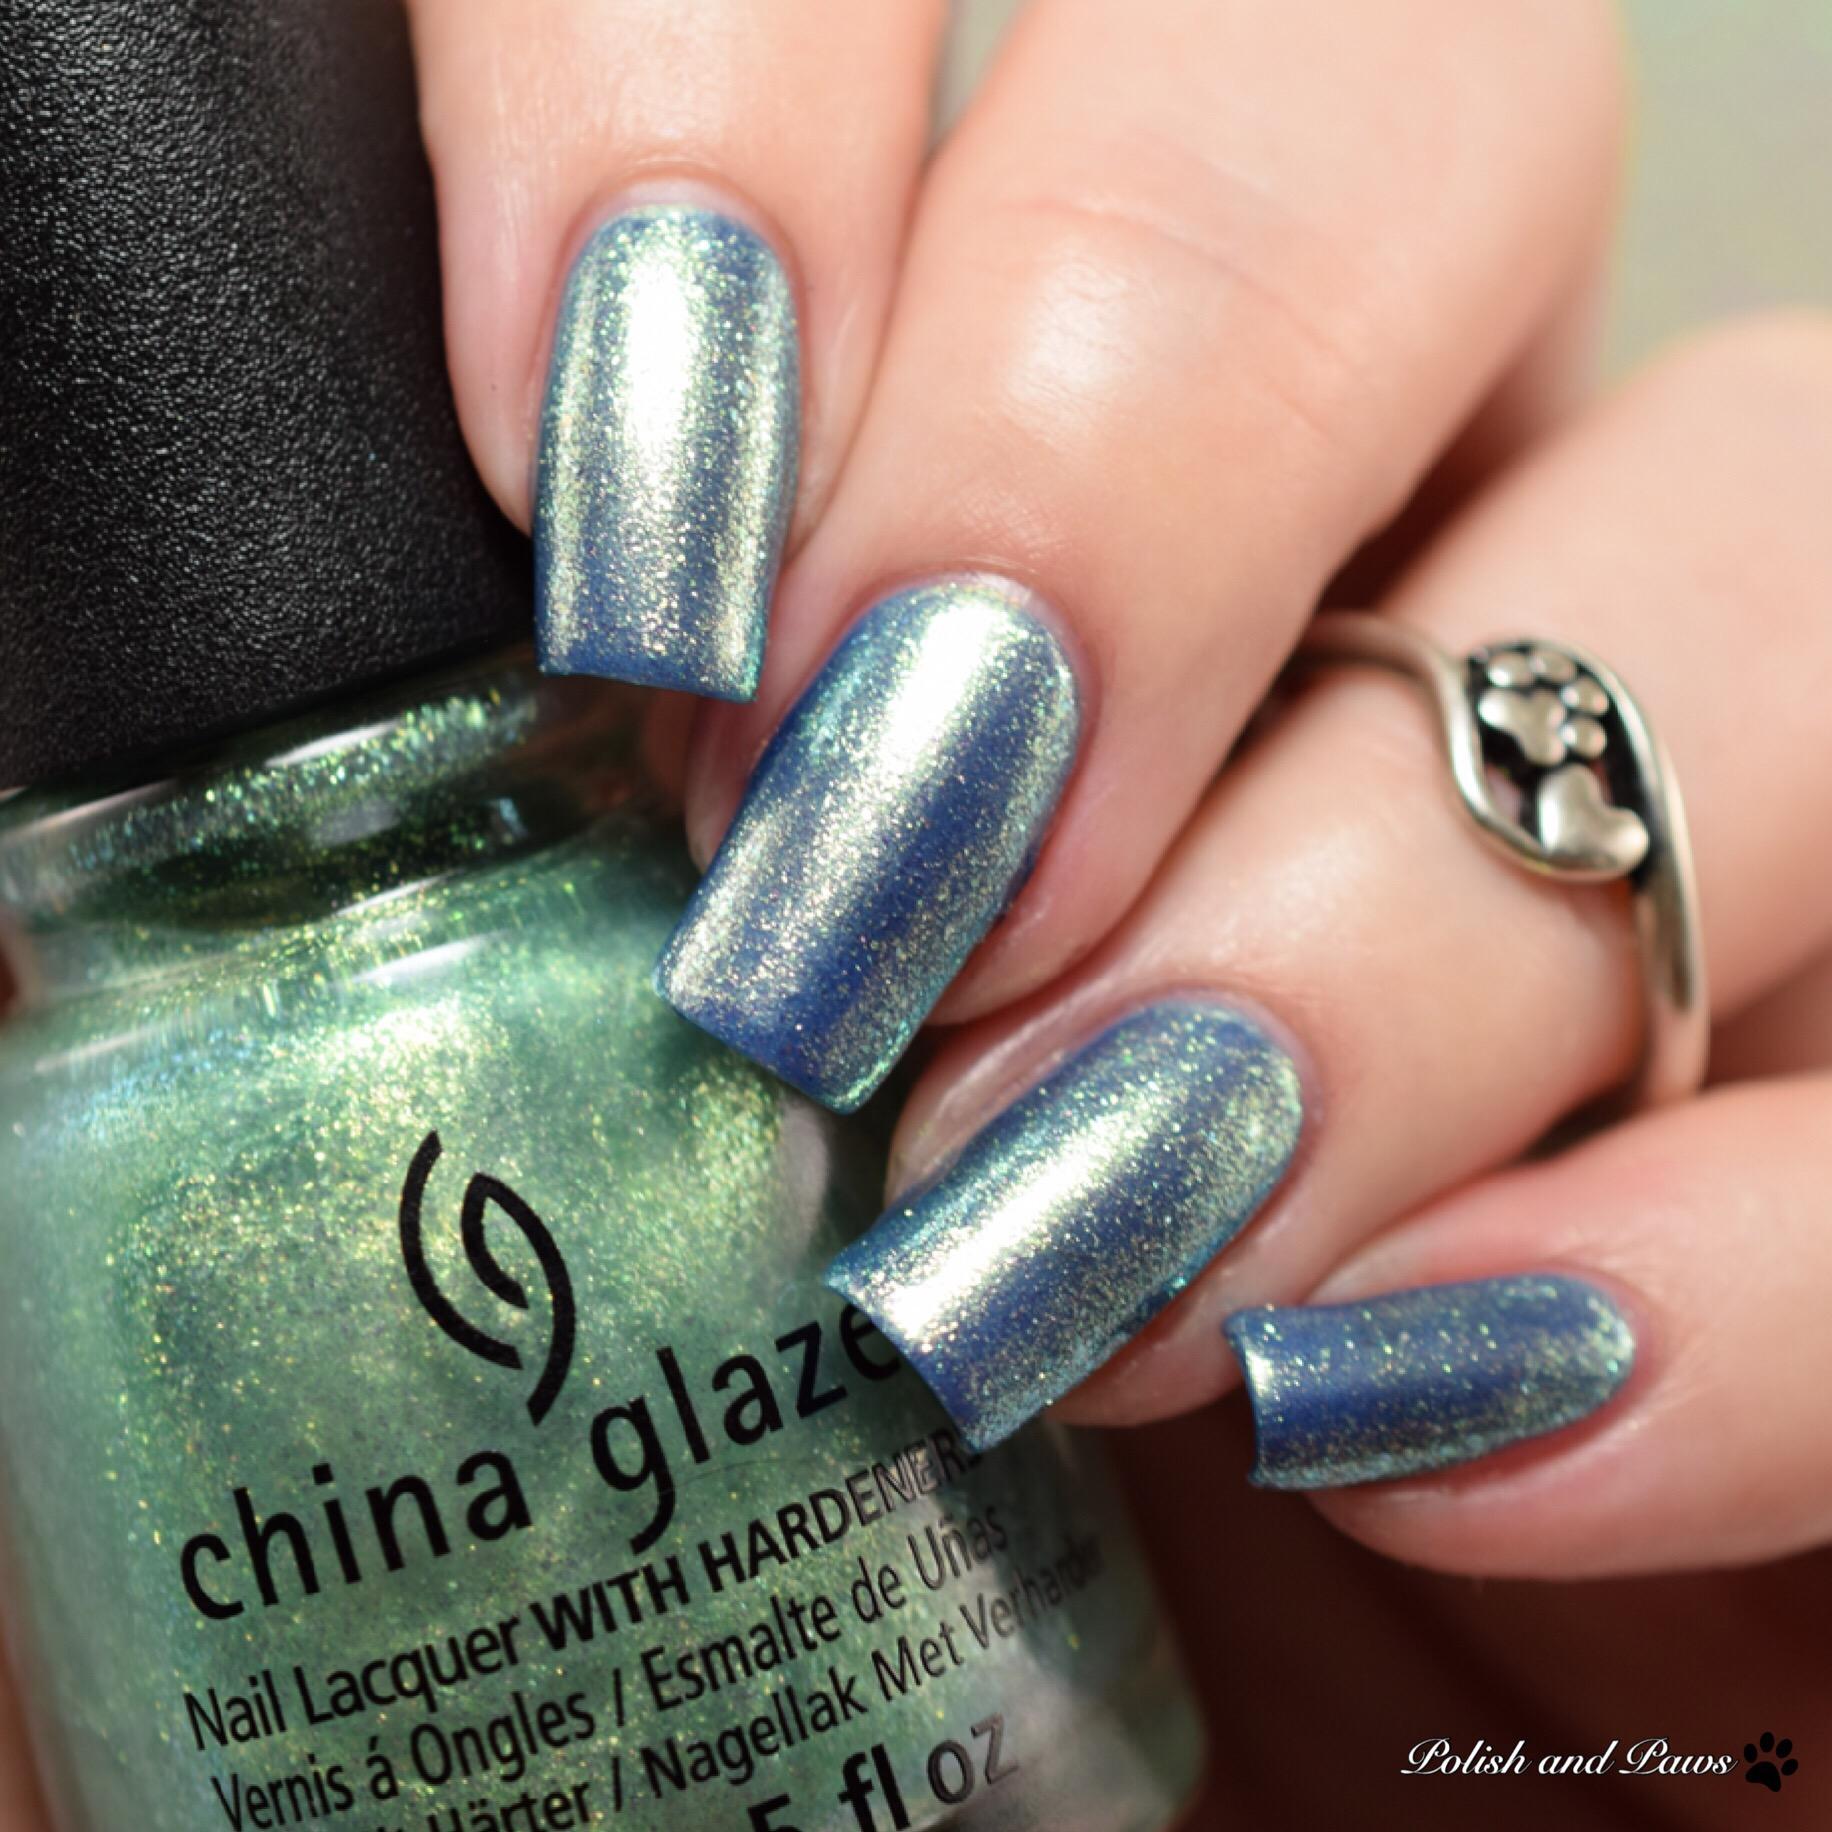 China Glaze Twinkle Twinkle Little Starfish